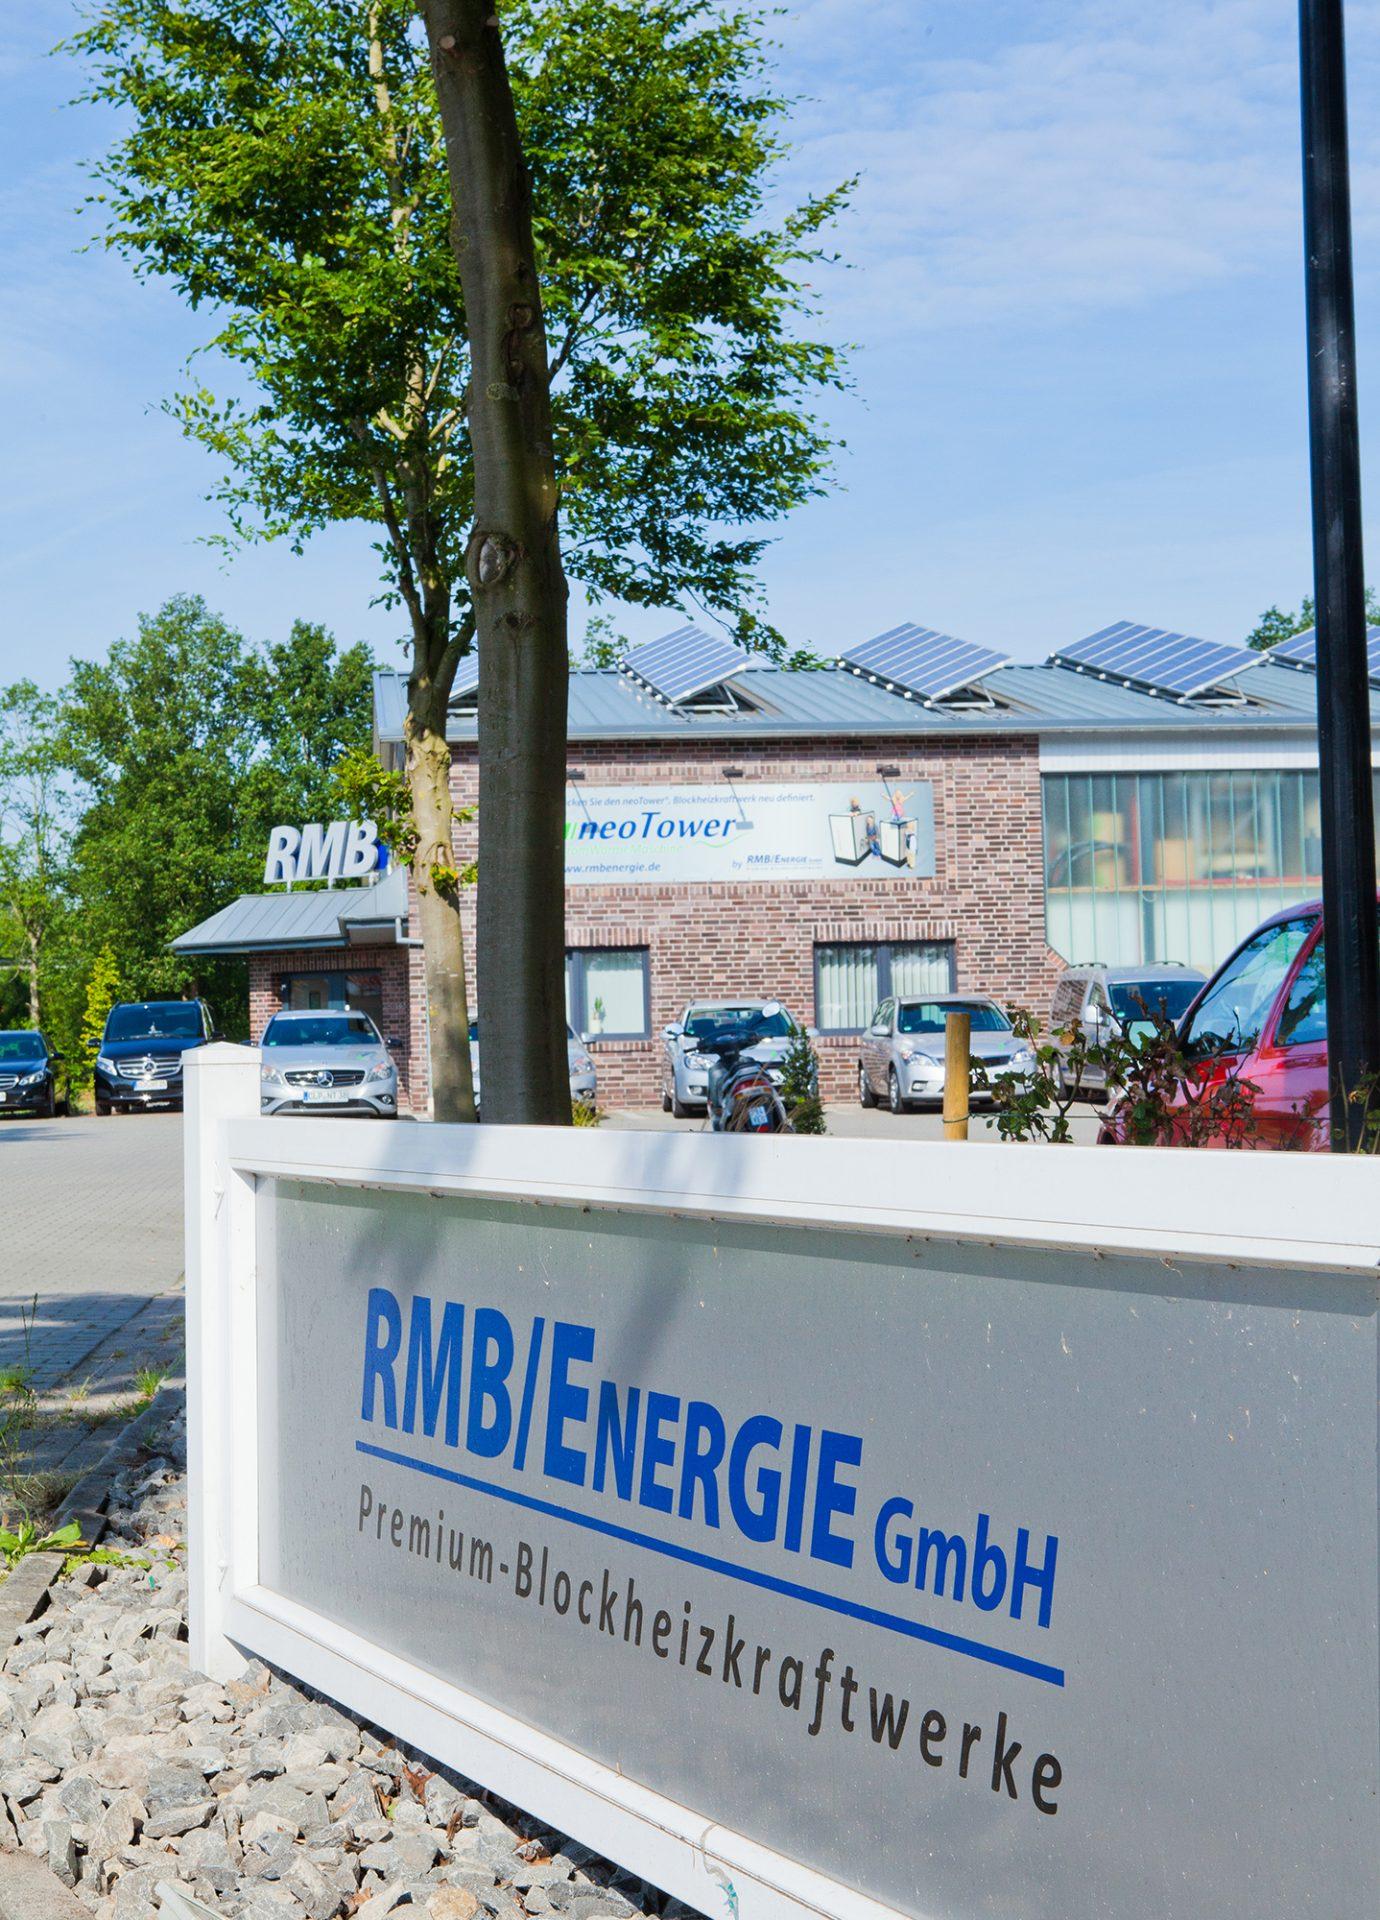 RMB ENERGIE neoTower